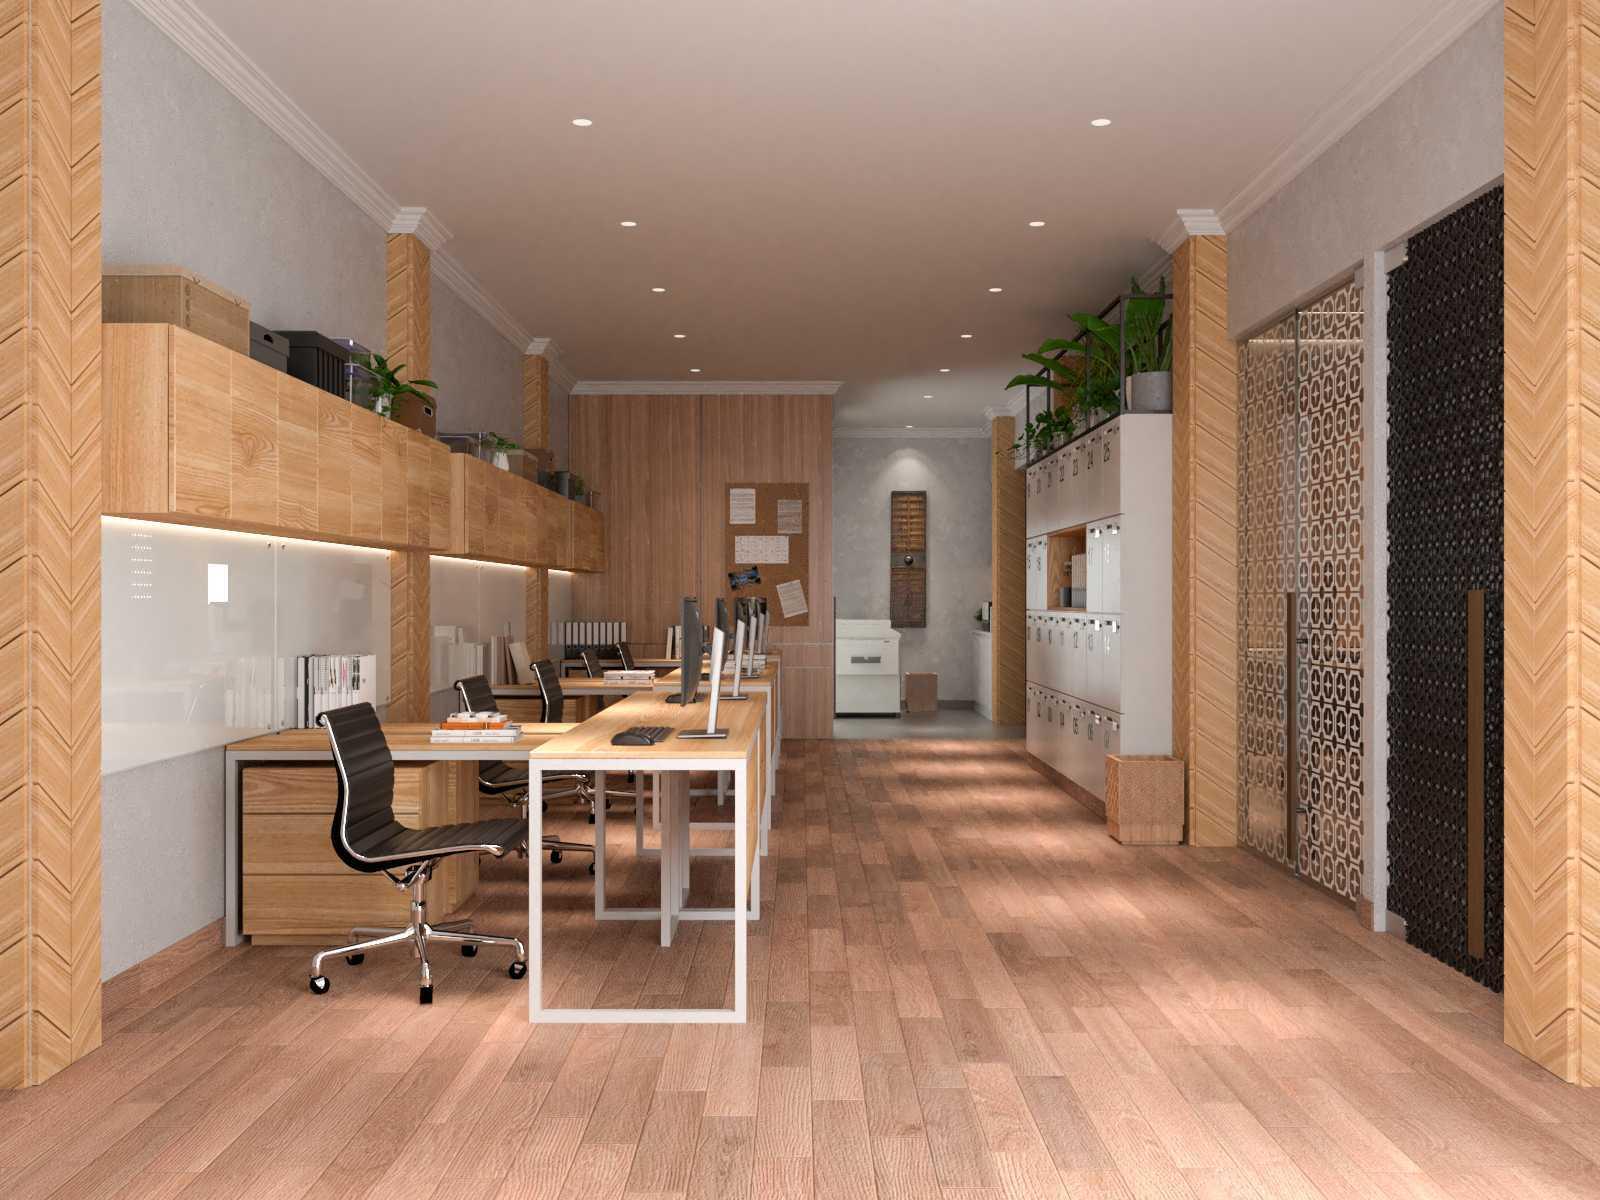 Vindo Design Modern Ethnic Office Jayapura, Kota Jayapura, Papua, Indonesia Jayapura, Kota Jayapura, Papua, Indonesia Vindo-Design-Modern-Ethnic-Office  66589